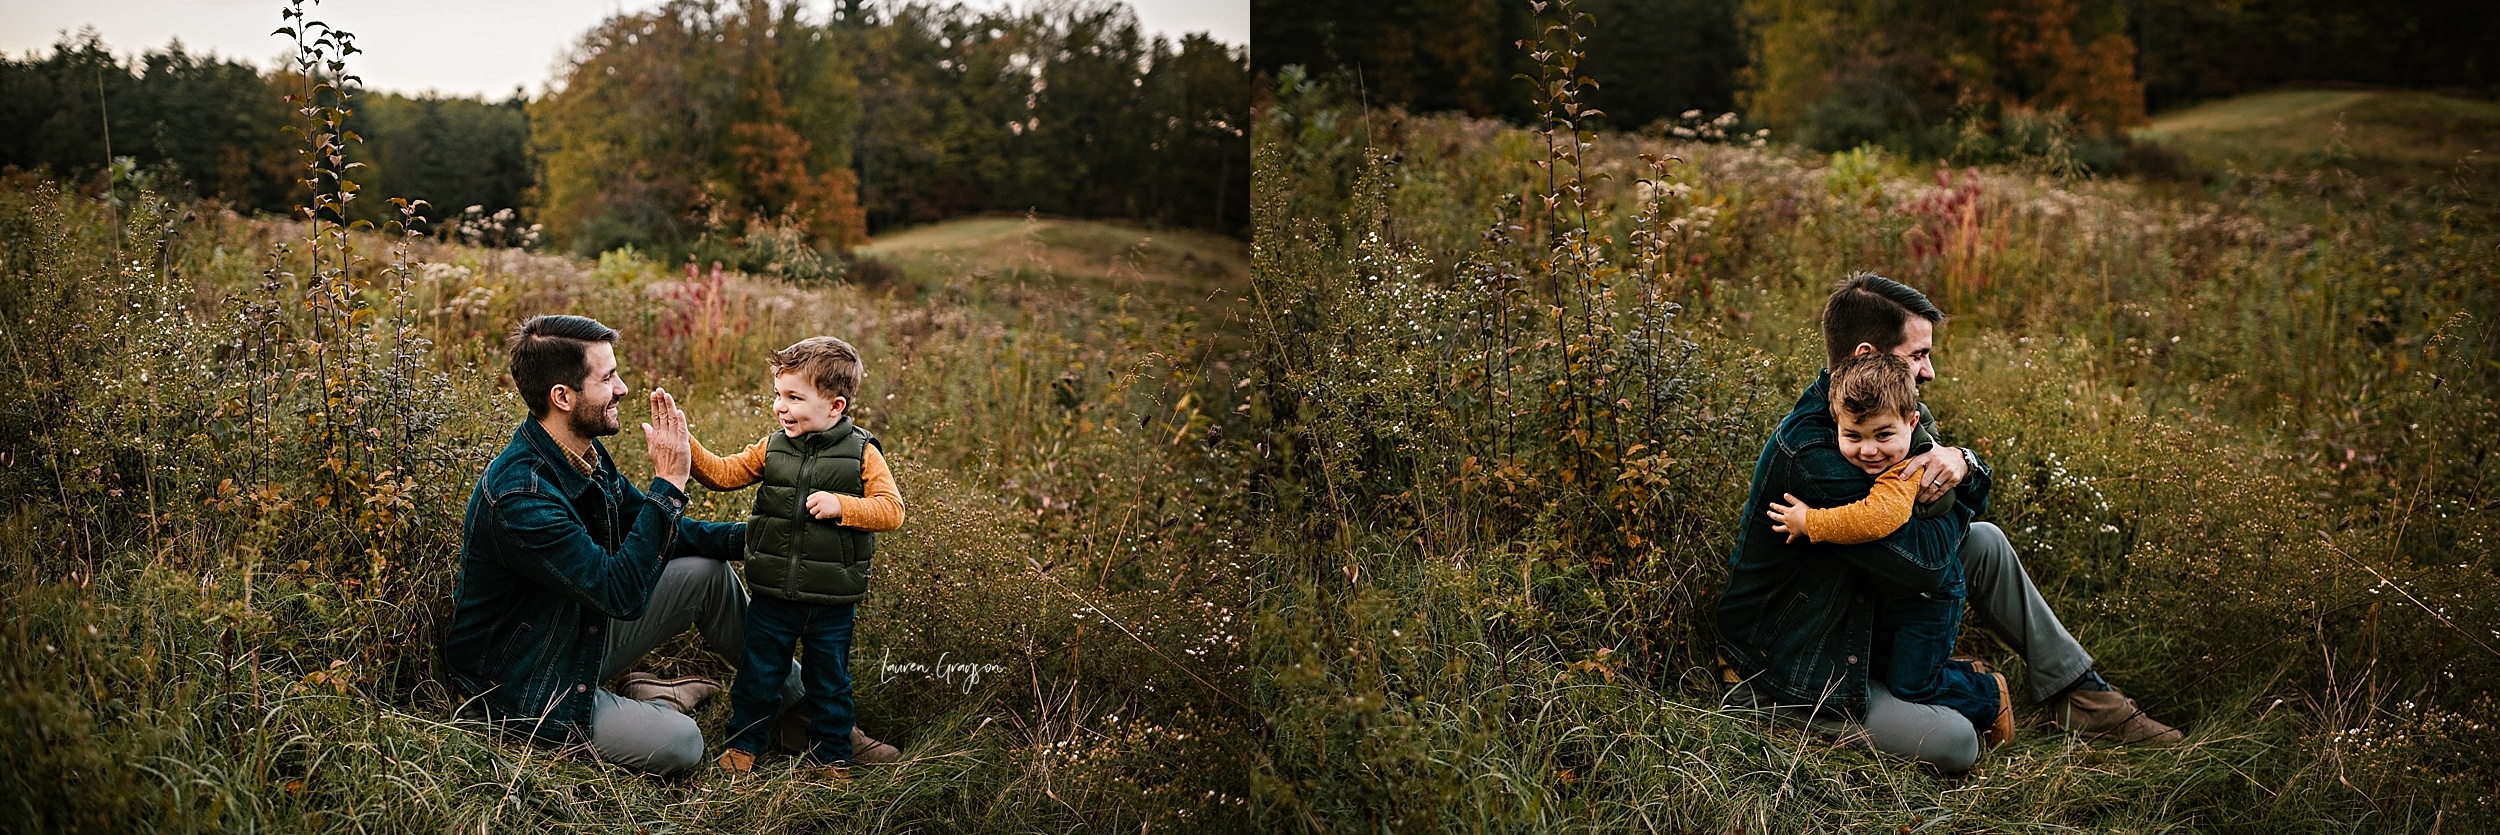 lauren-grayson-photography-akron-photographer-family-carro_1008.jpg